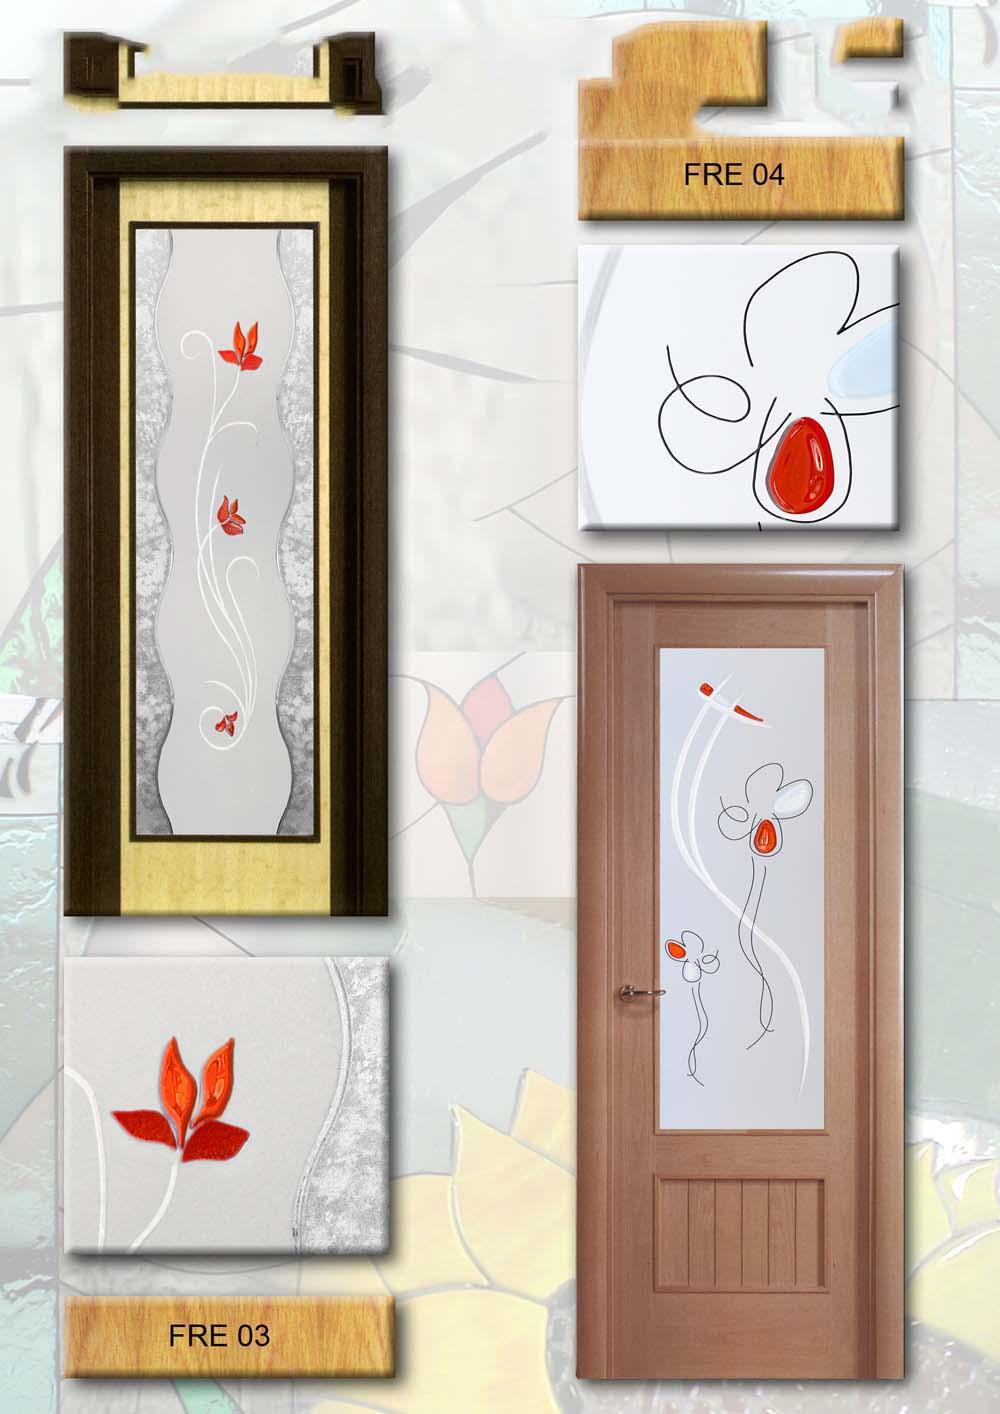 Cristales puerta interior for Cristales puertas interior